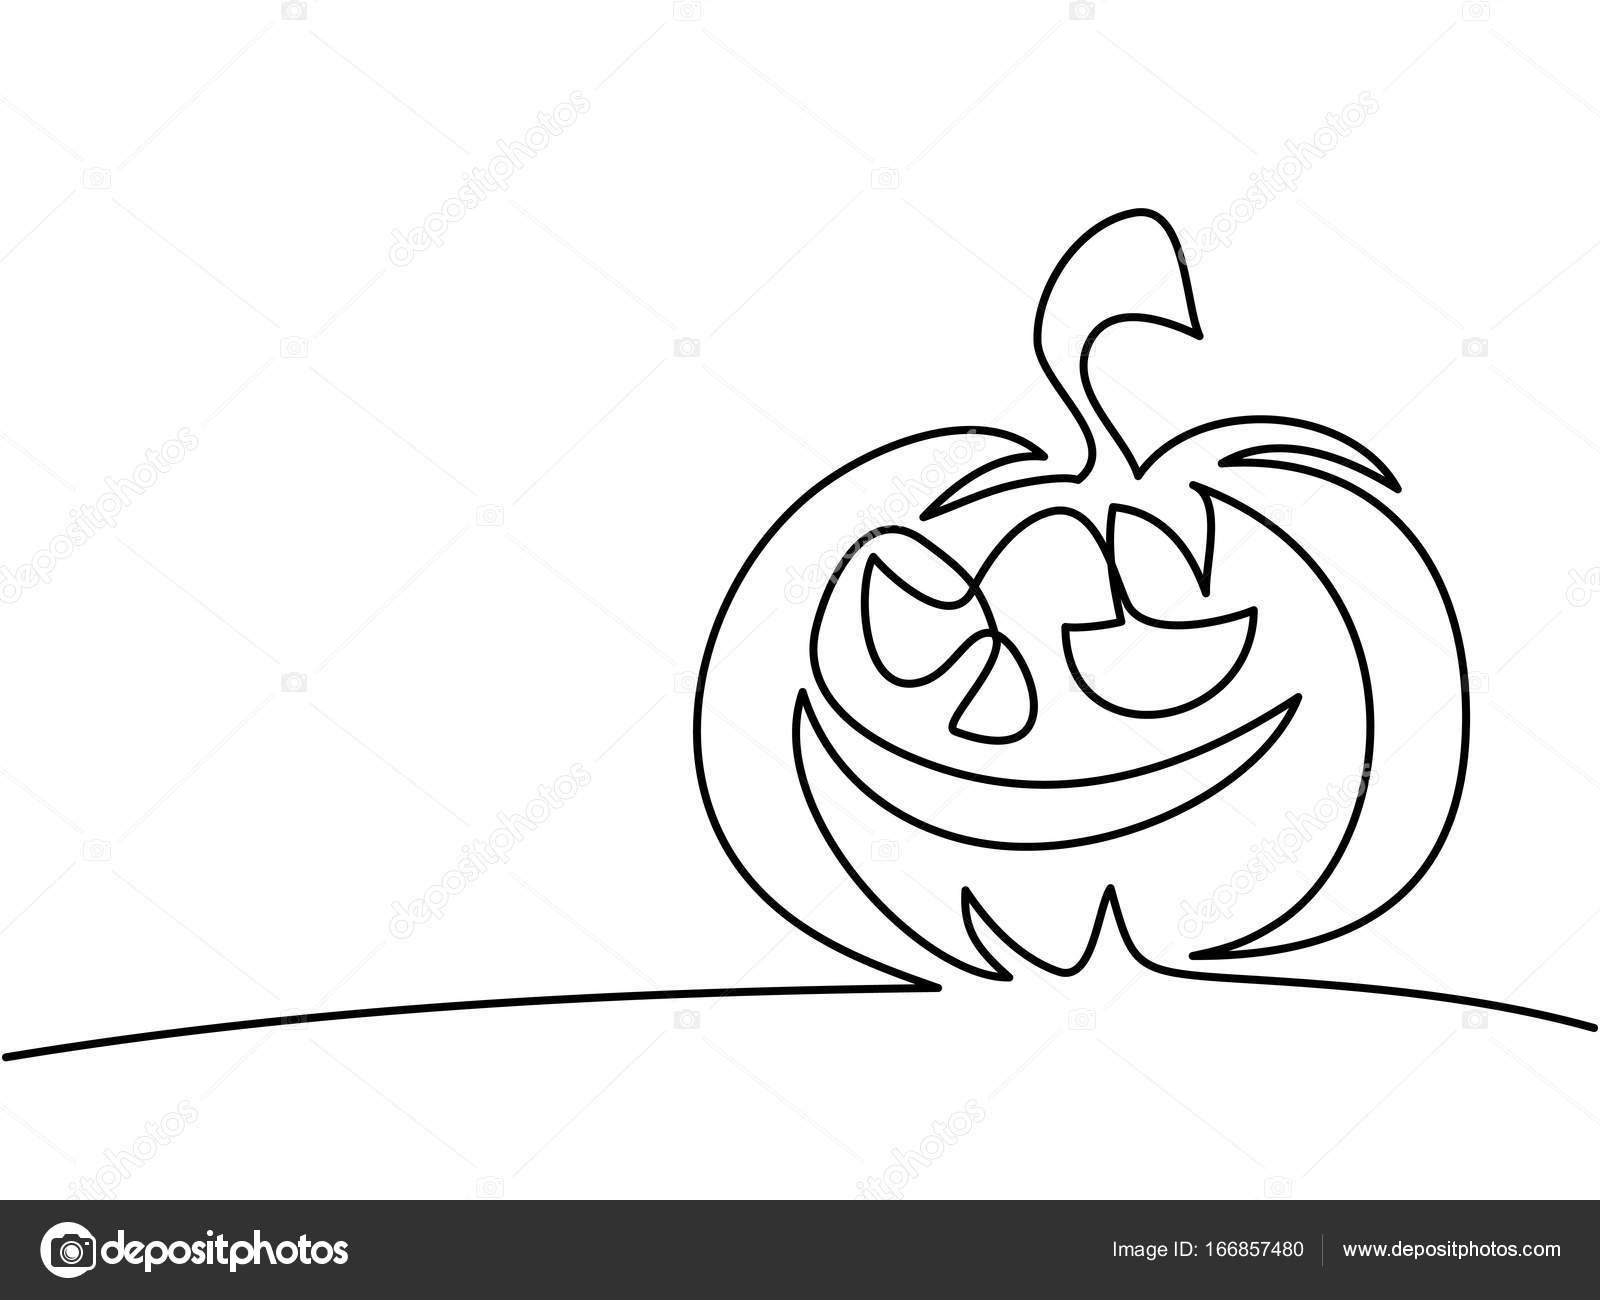 1600x1300 Continuous Line Drawing Of Halloween Pumpkin Stock Vector